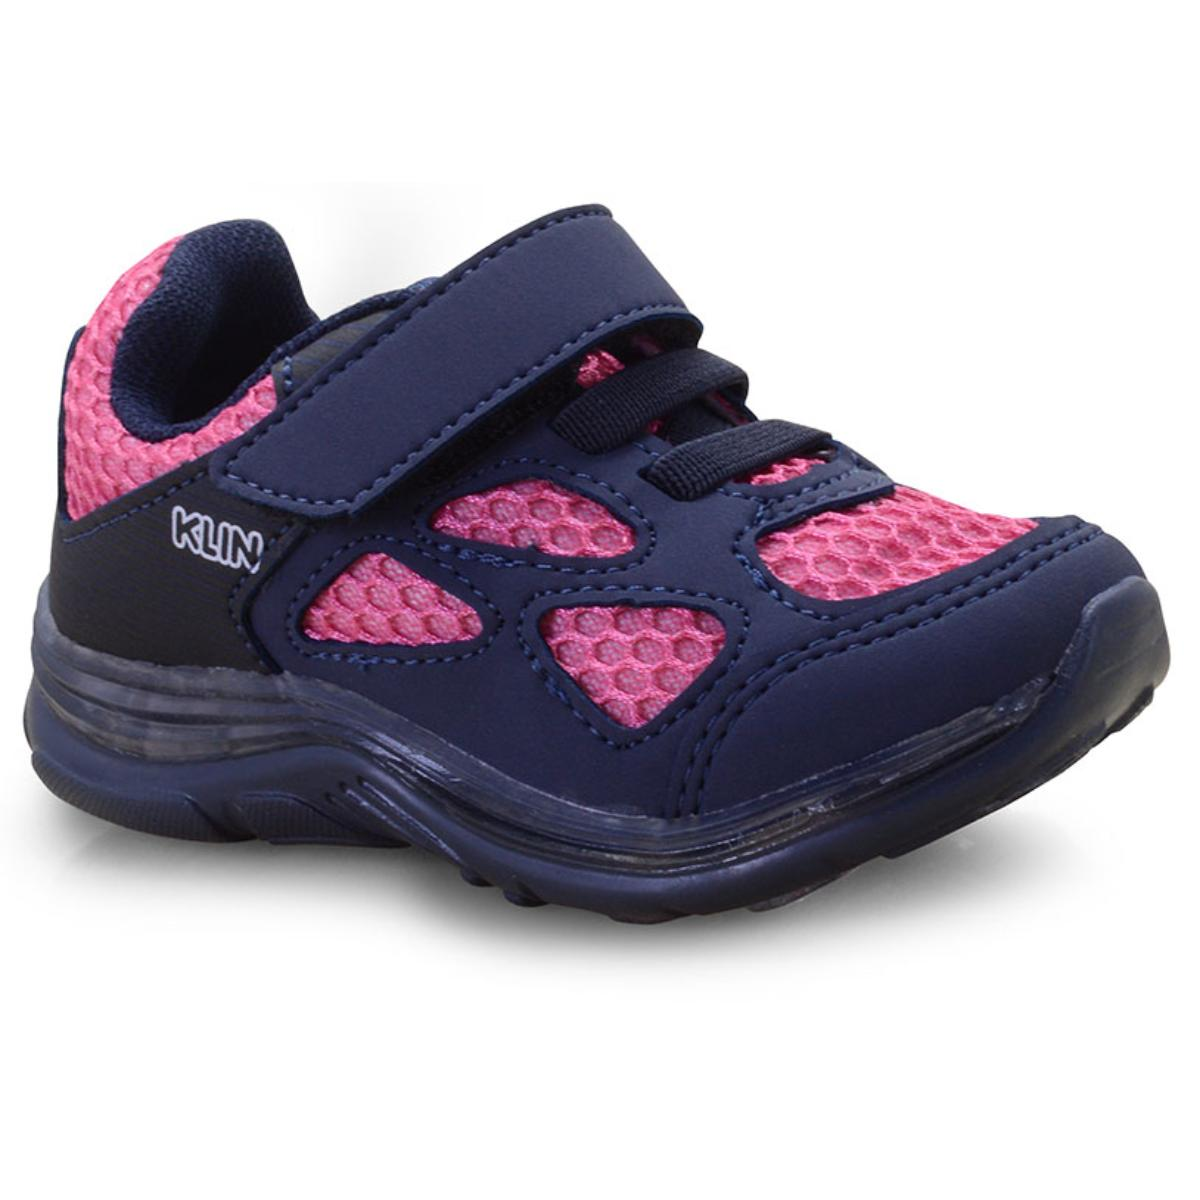 Tênis Fem Infantil Klin 989.010 Marinho/pink